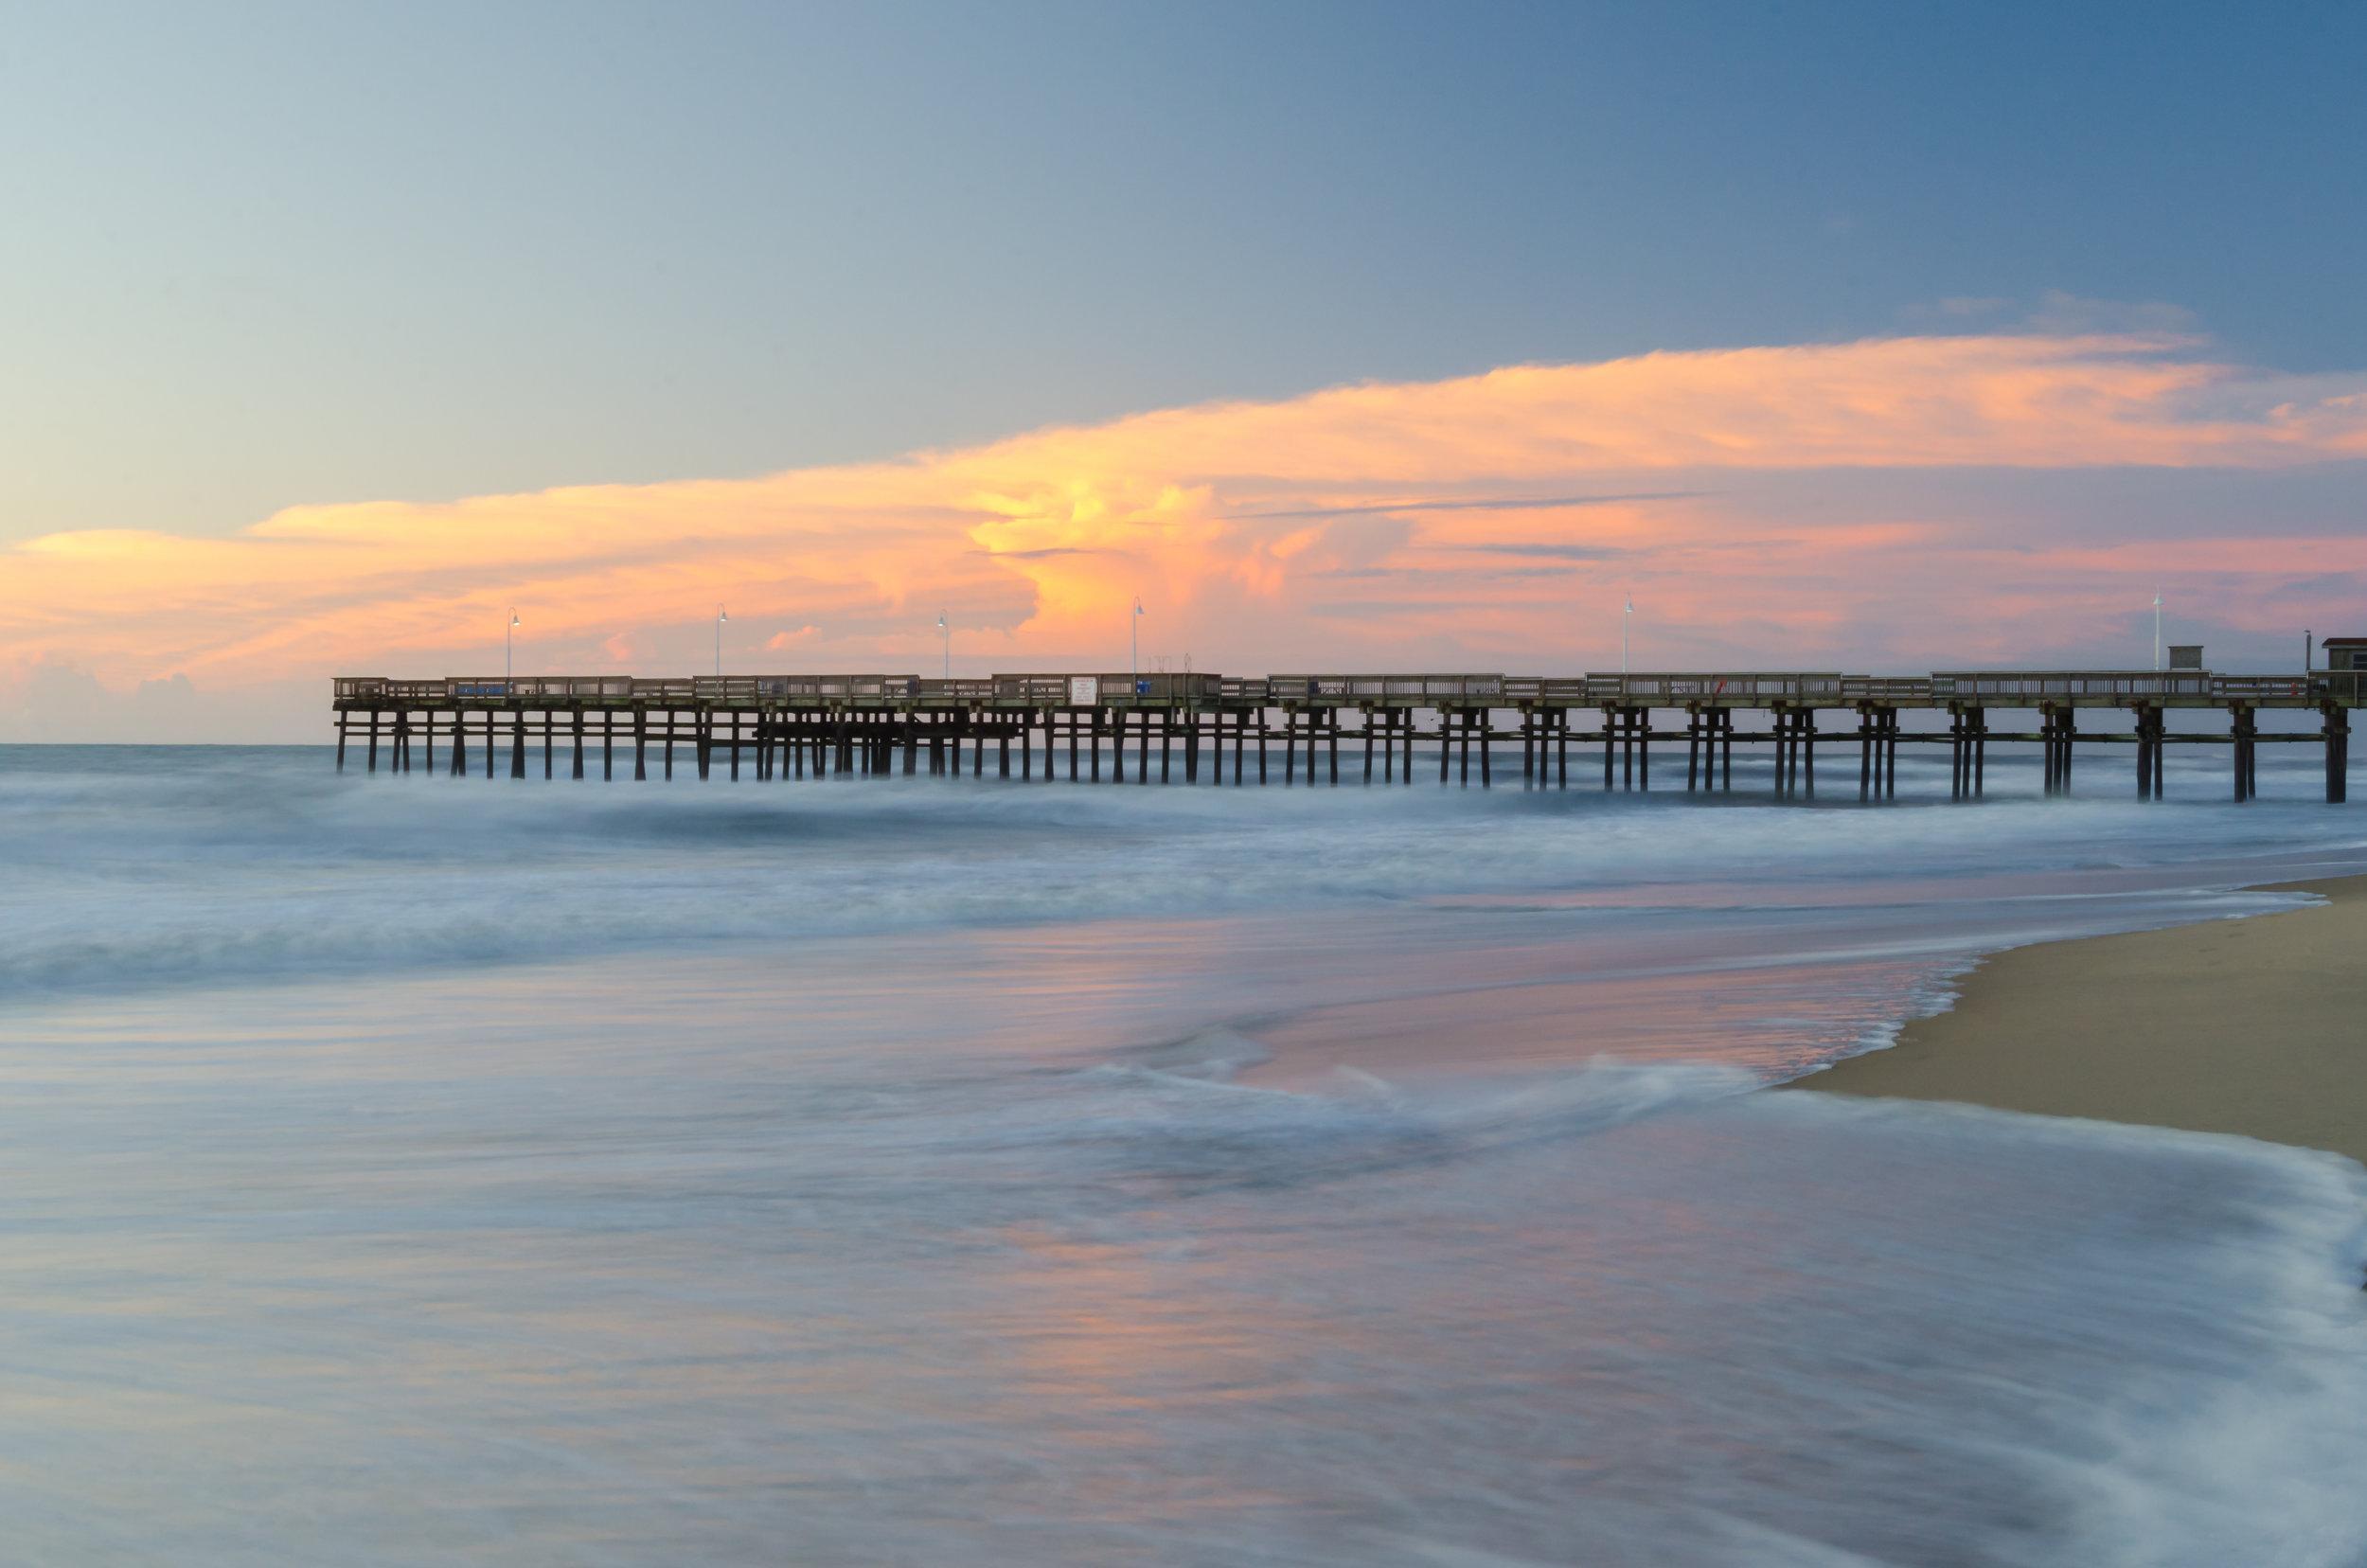 sandbridge-sandbridge pier-sandbridge beach-pier-sunrise-dawn-Virginia Beach-Virginia-long exposure-beach.jpg